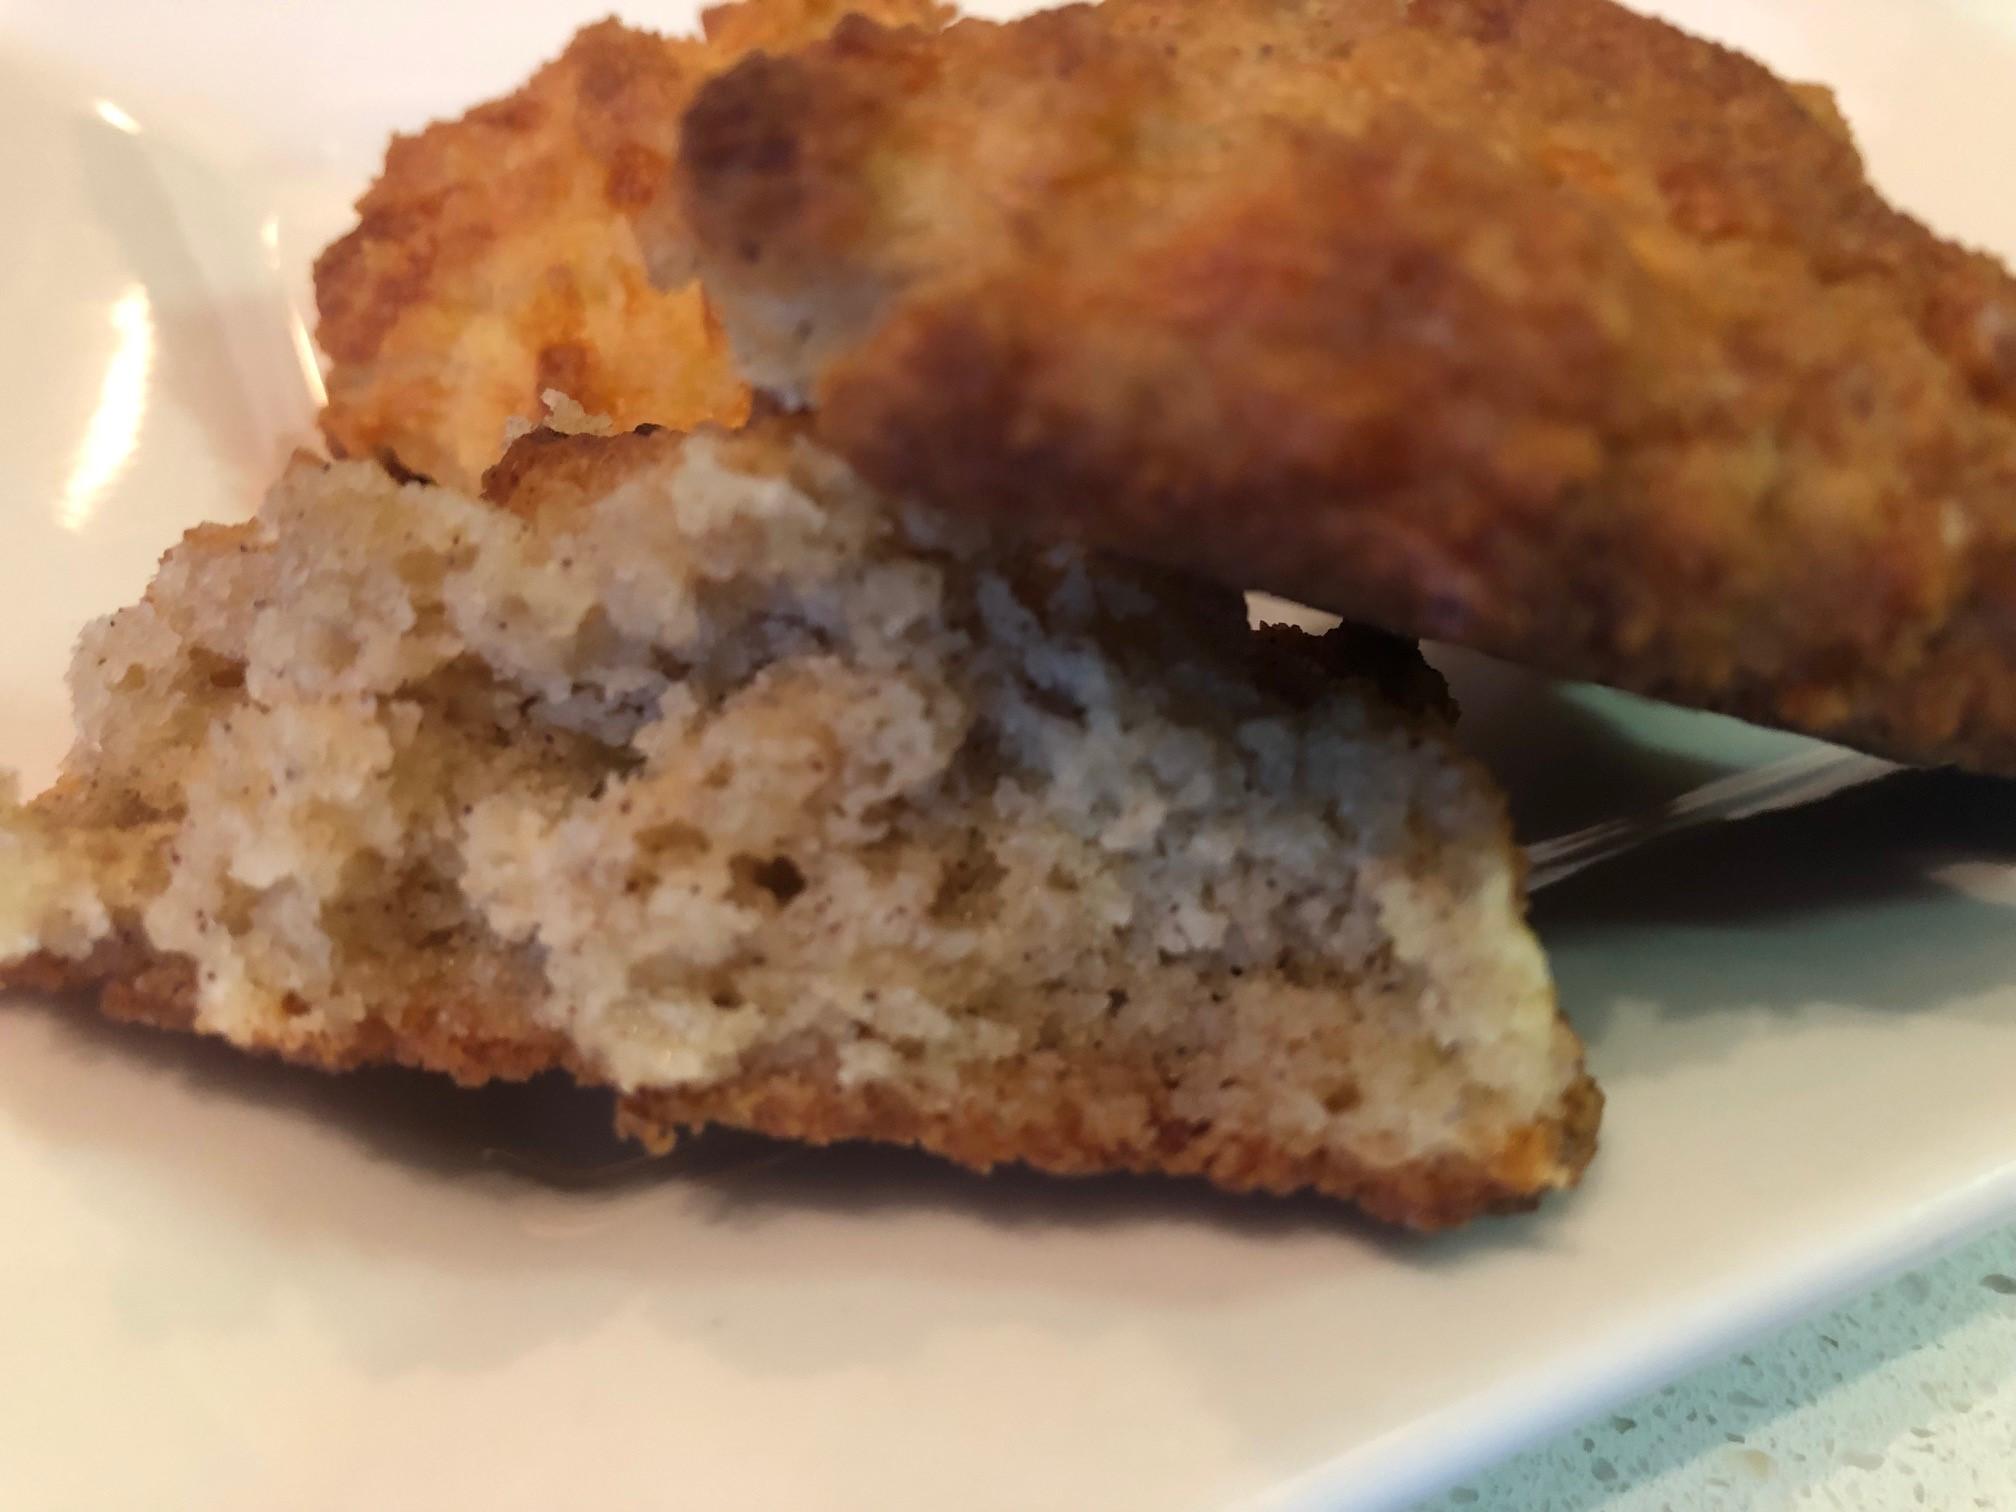 Keto-Friendly Cinnamon Biscuits